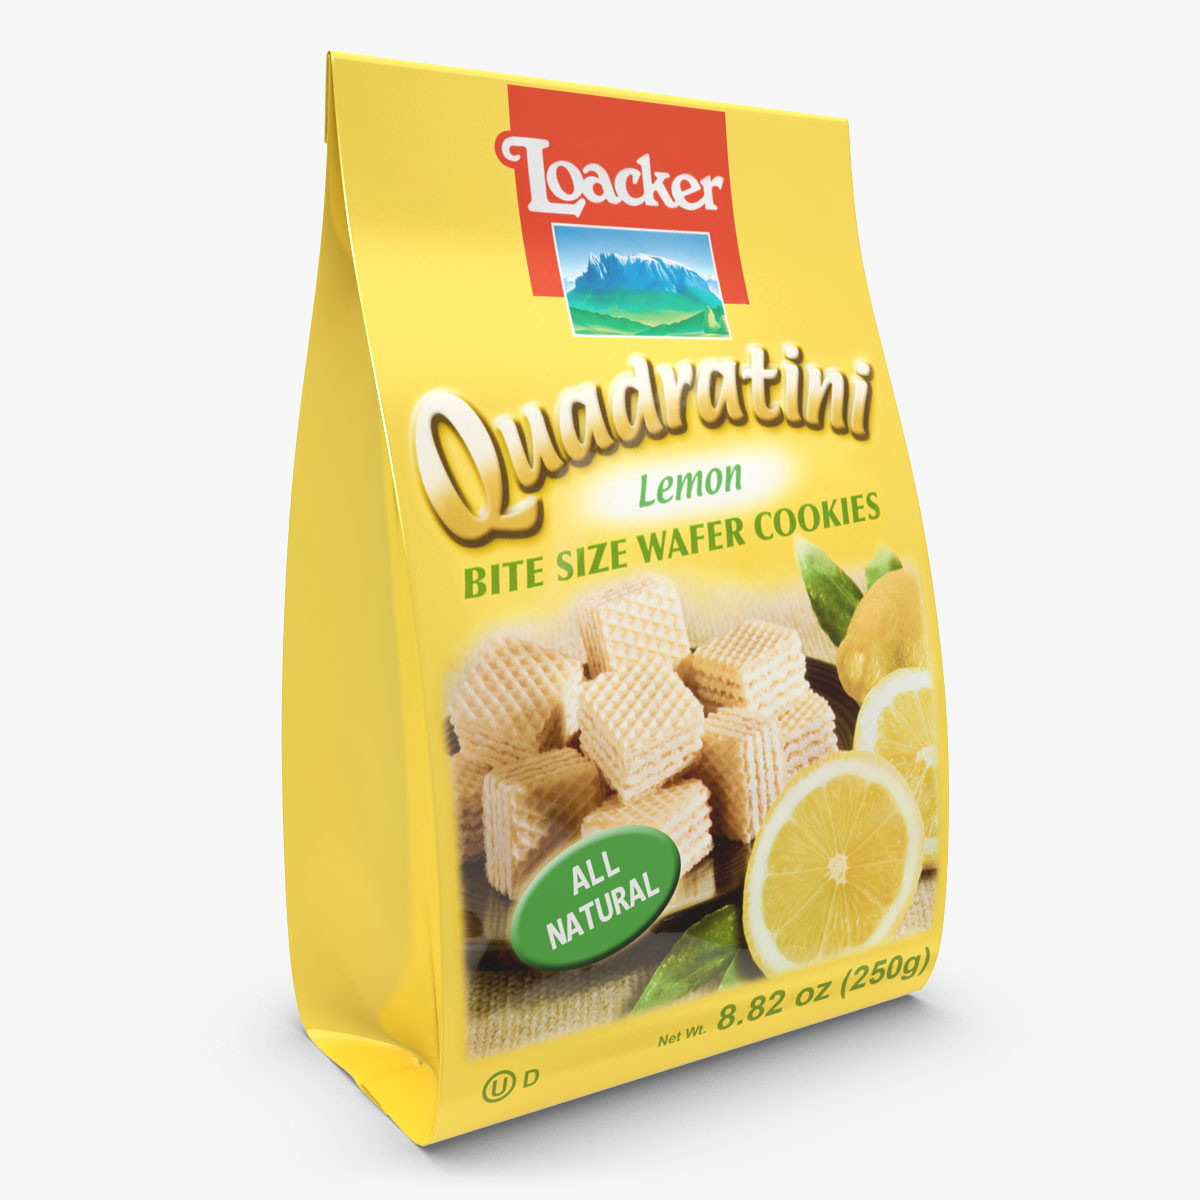 Loacker Quadratini Lemon Wafers